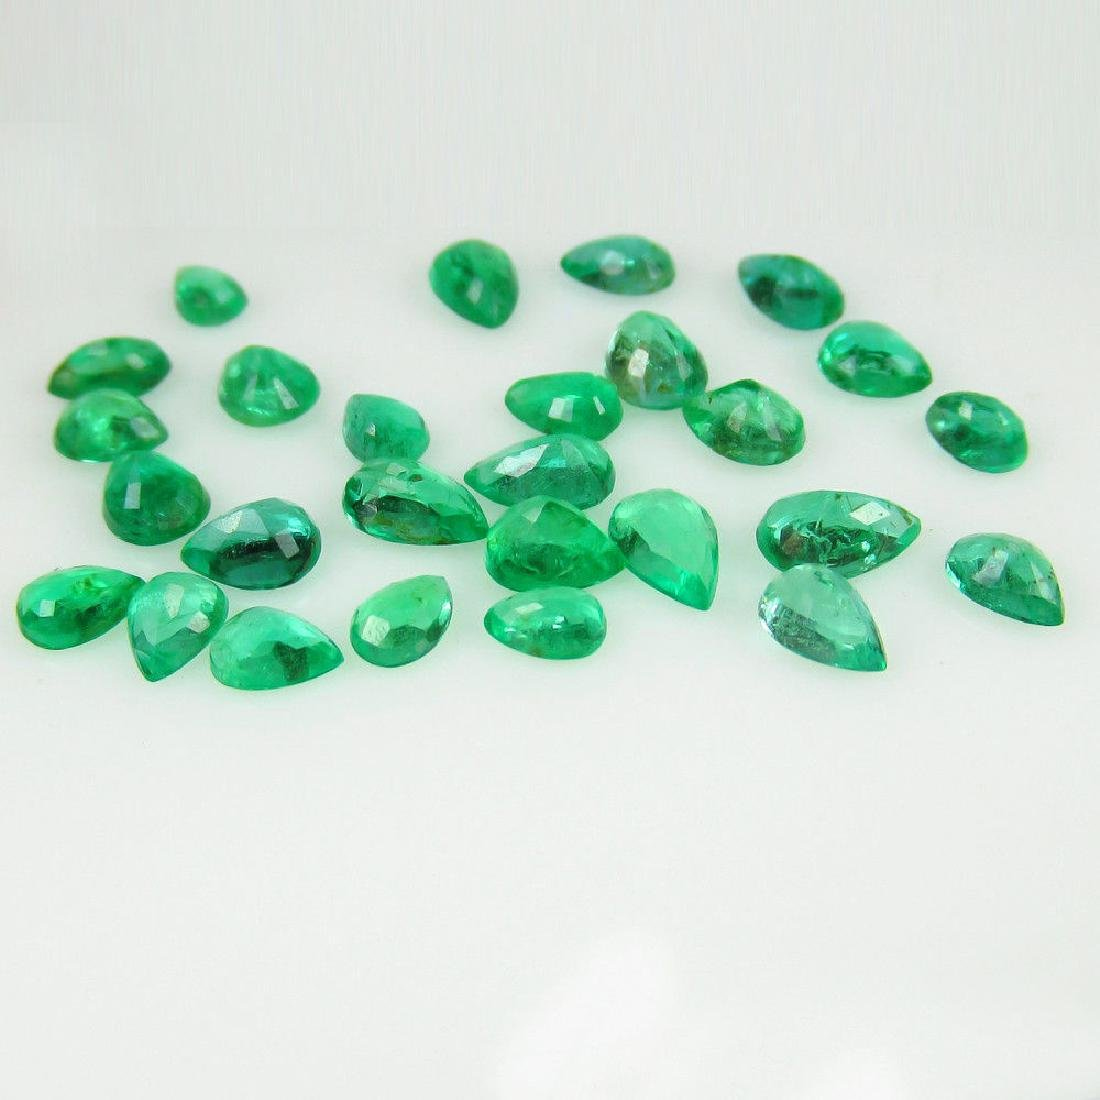 6.58 Carat 27 Loose Emeralds Pear cut Lot - 2